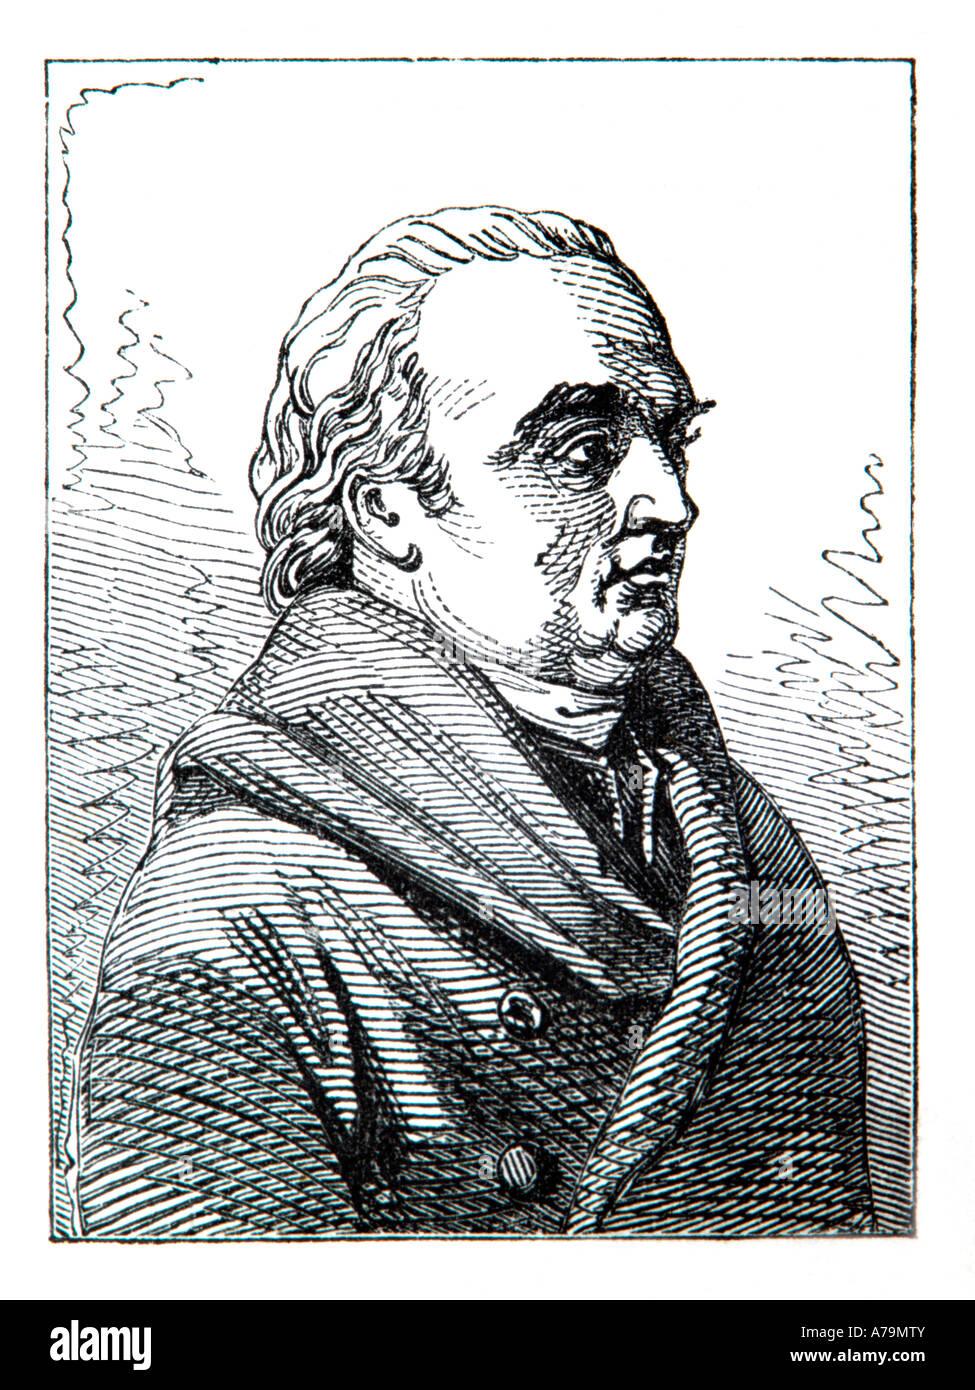 Sir William Herschel xviii secolo astronomo Immagini Stock